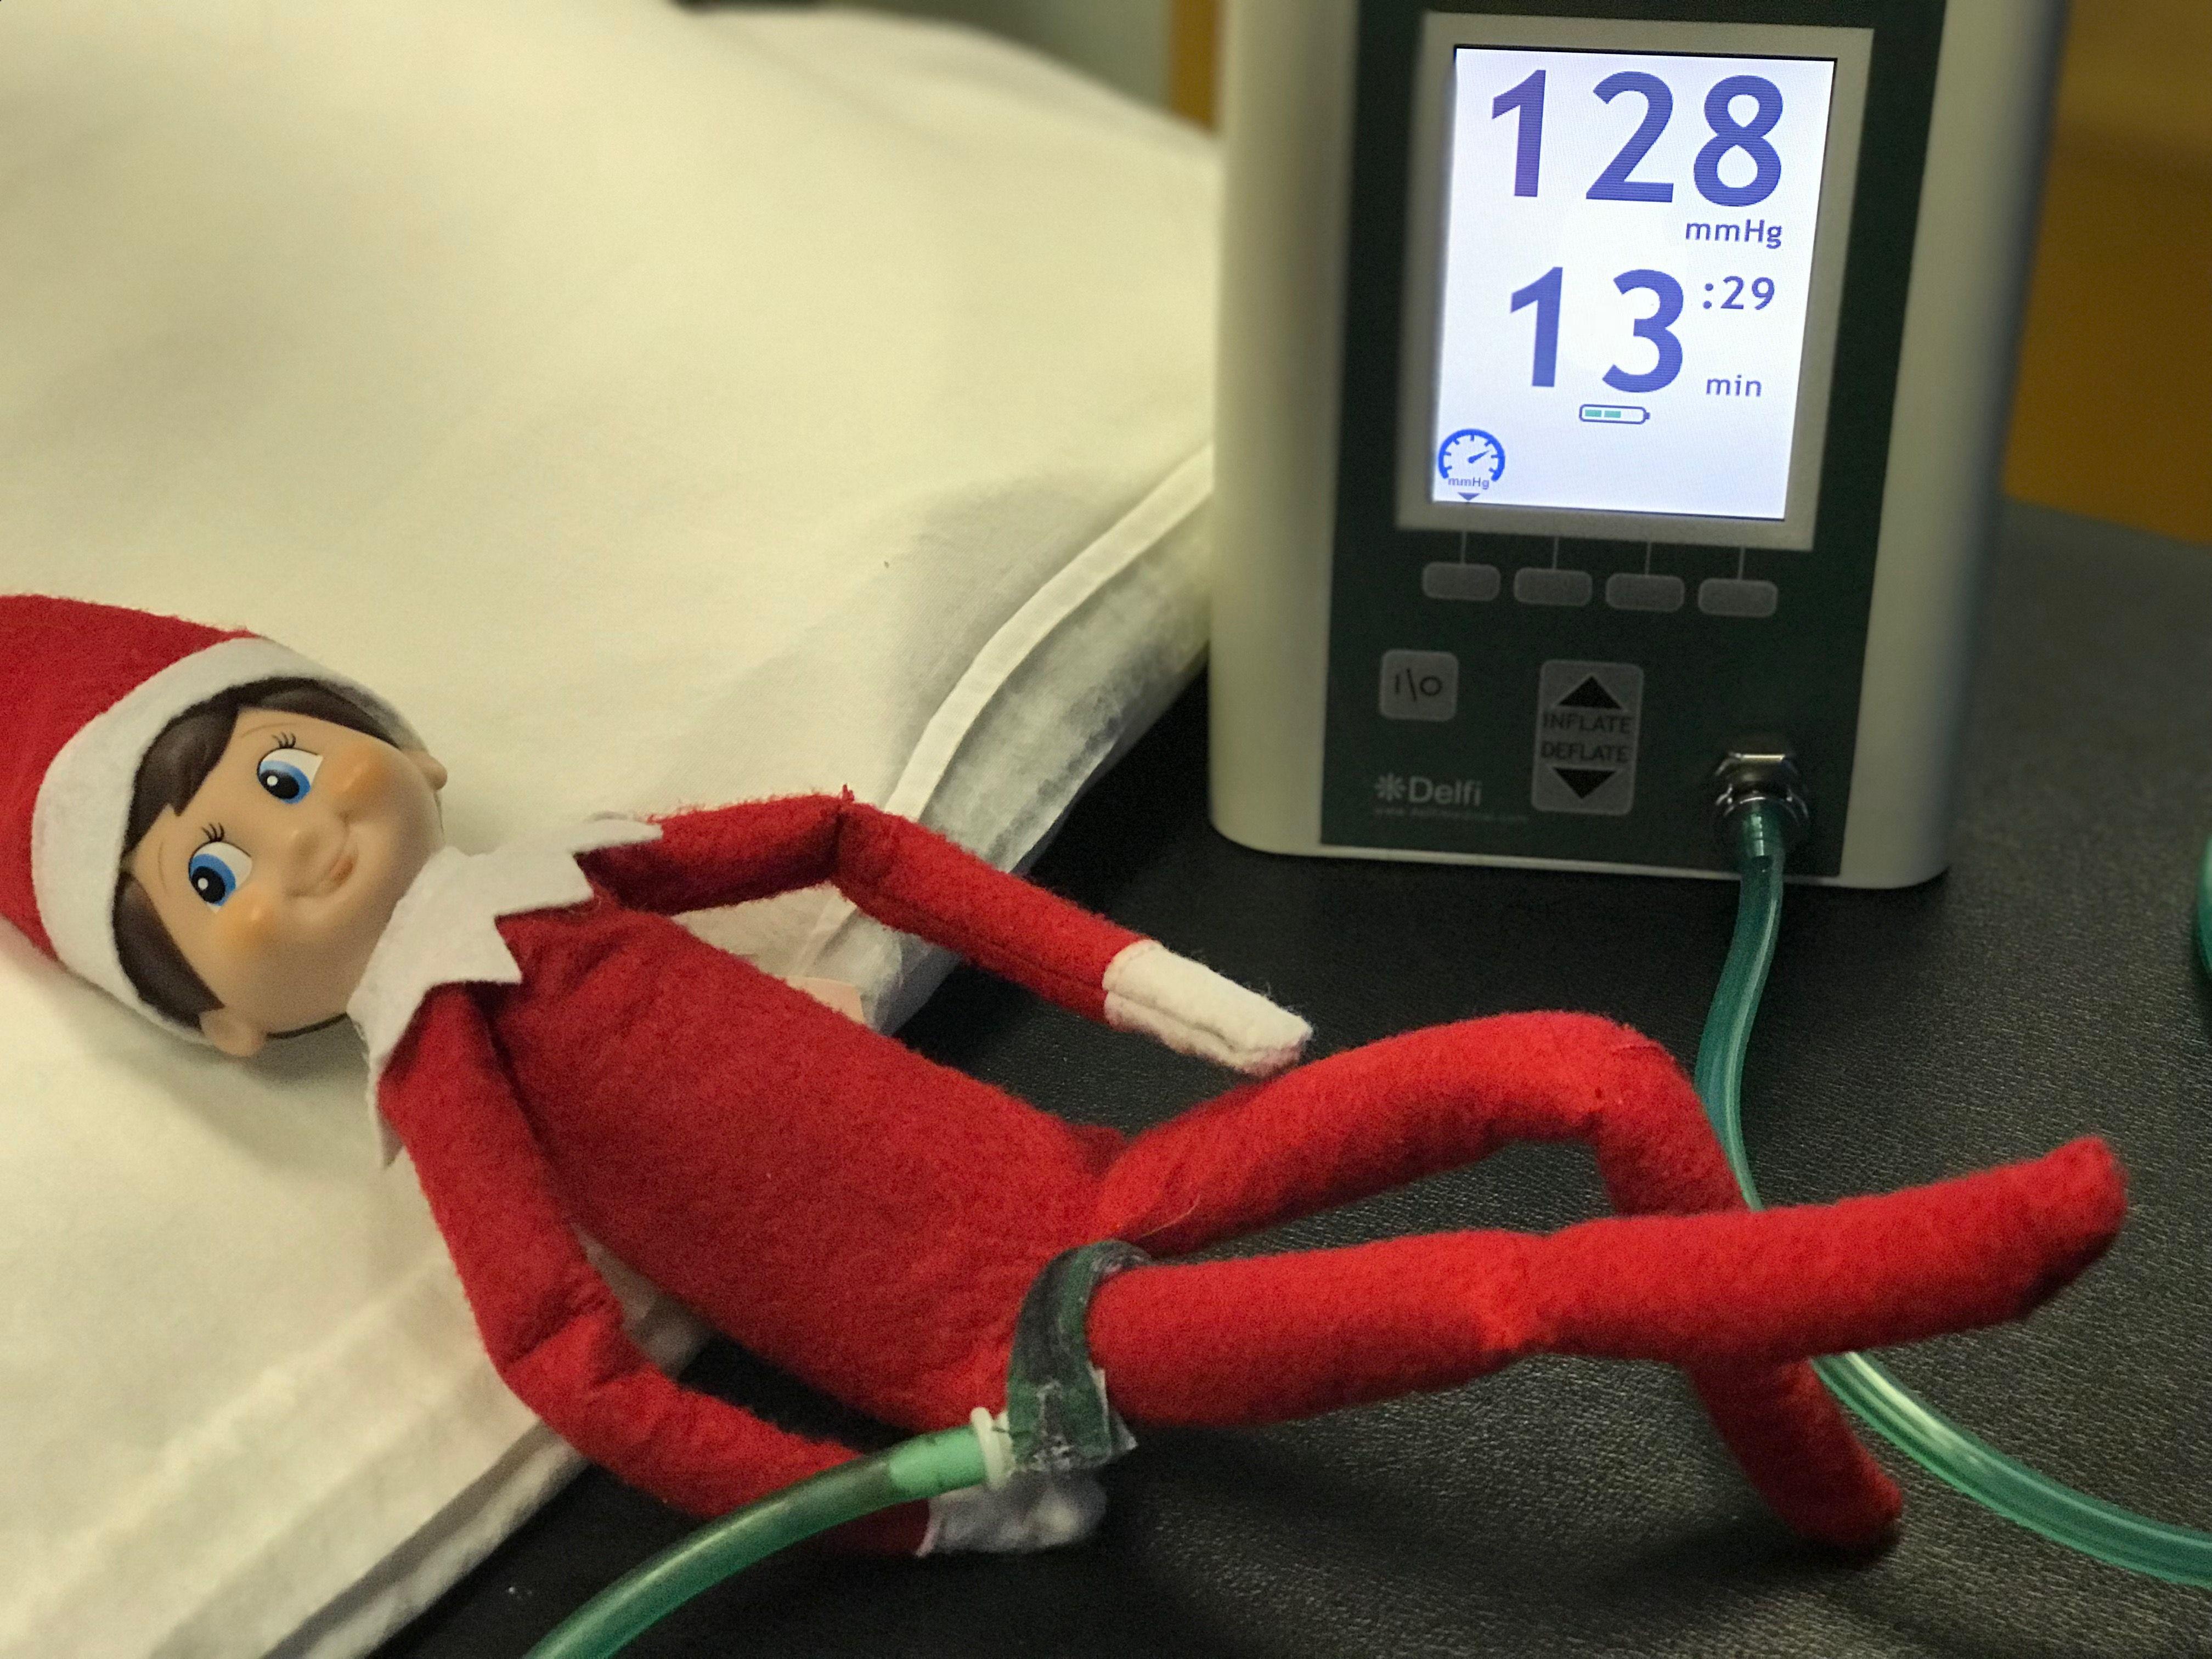 Elf on a shelf rehab with blood flow restriction rehab